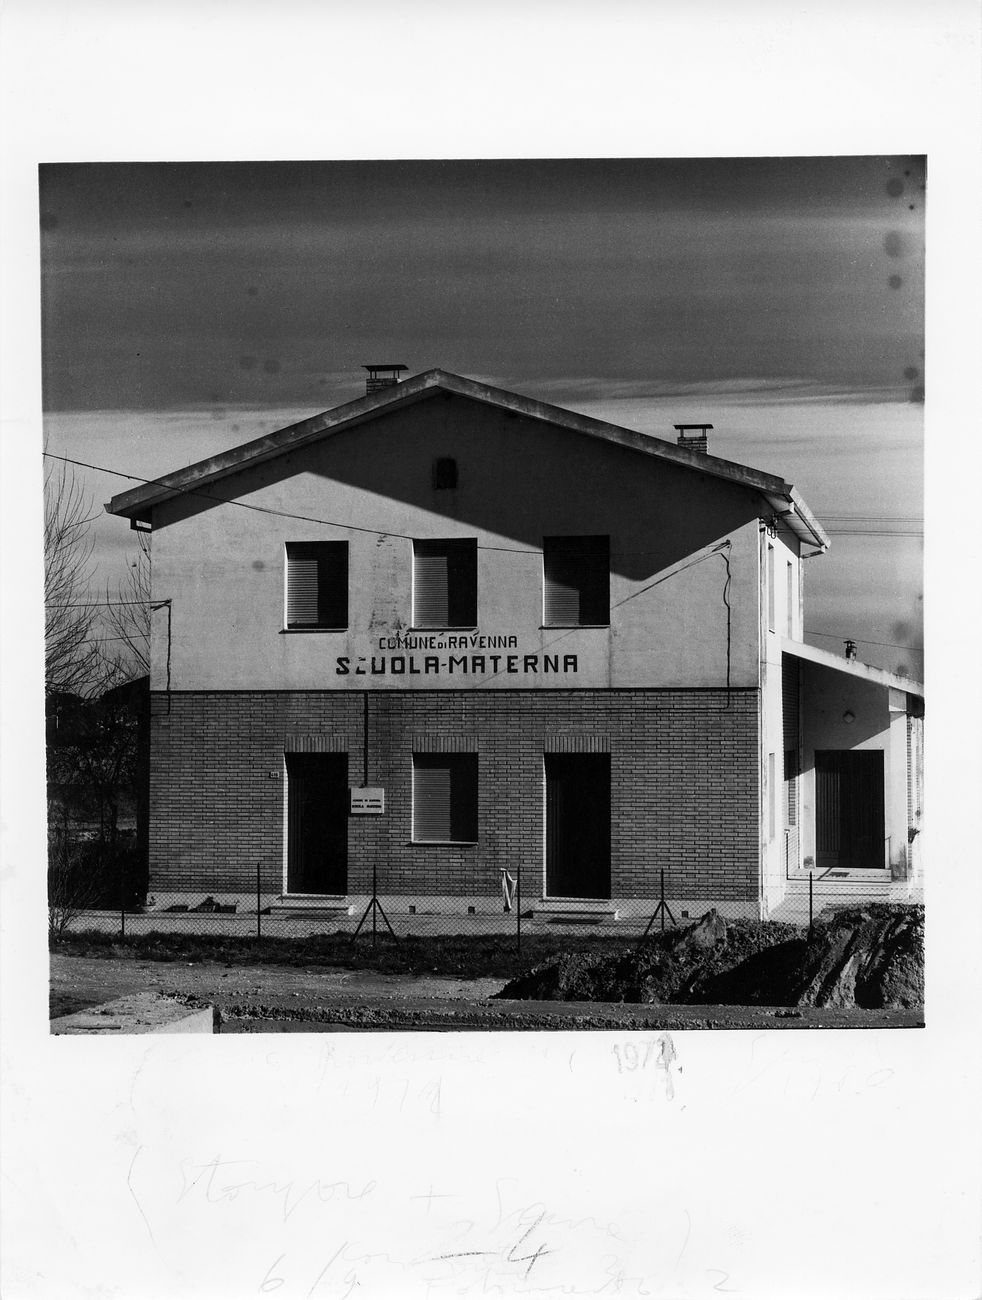 Guido Guidi, Fosso Ghiaia, Ravenna, 1972